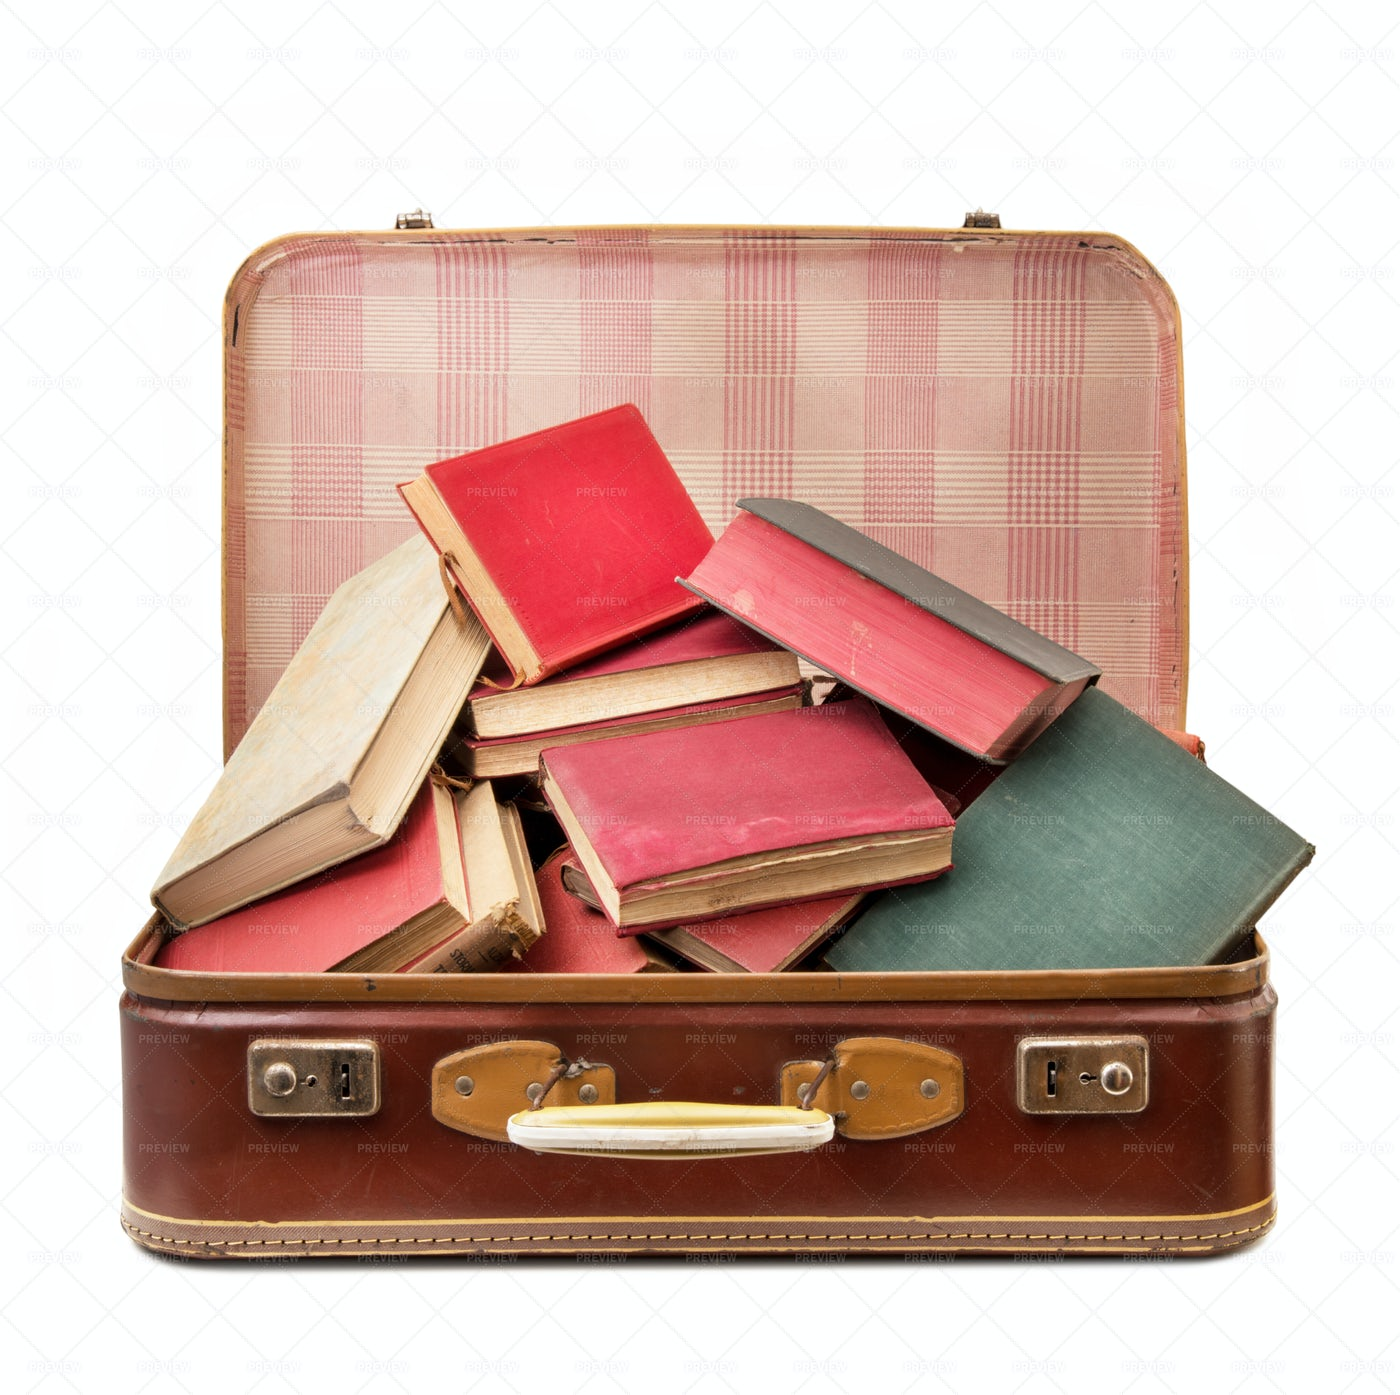 Suitcase Full Of Books: Stock Photos